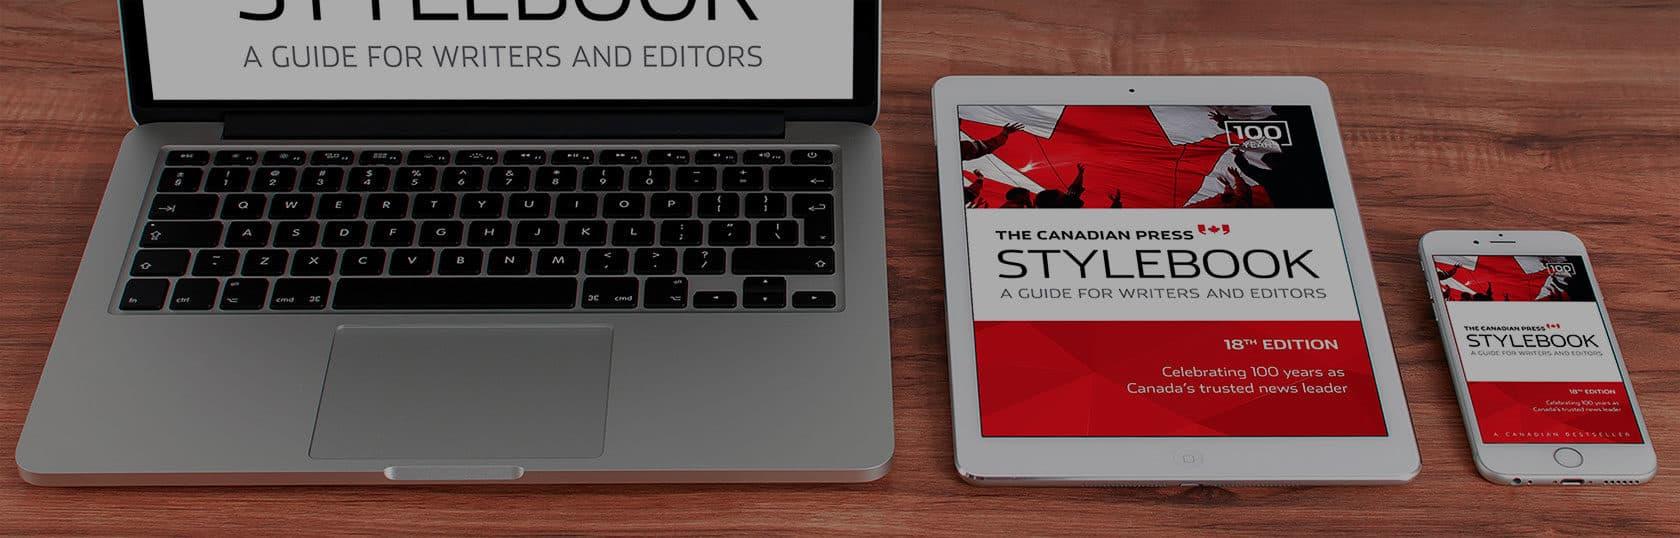 Canadian press stylebook free pdf